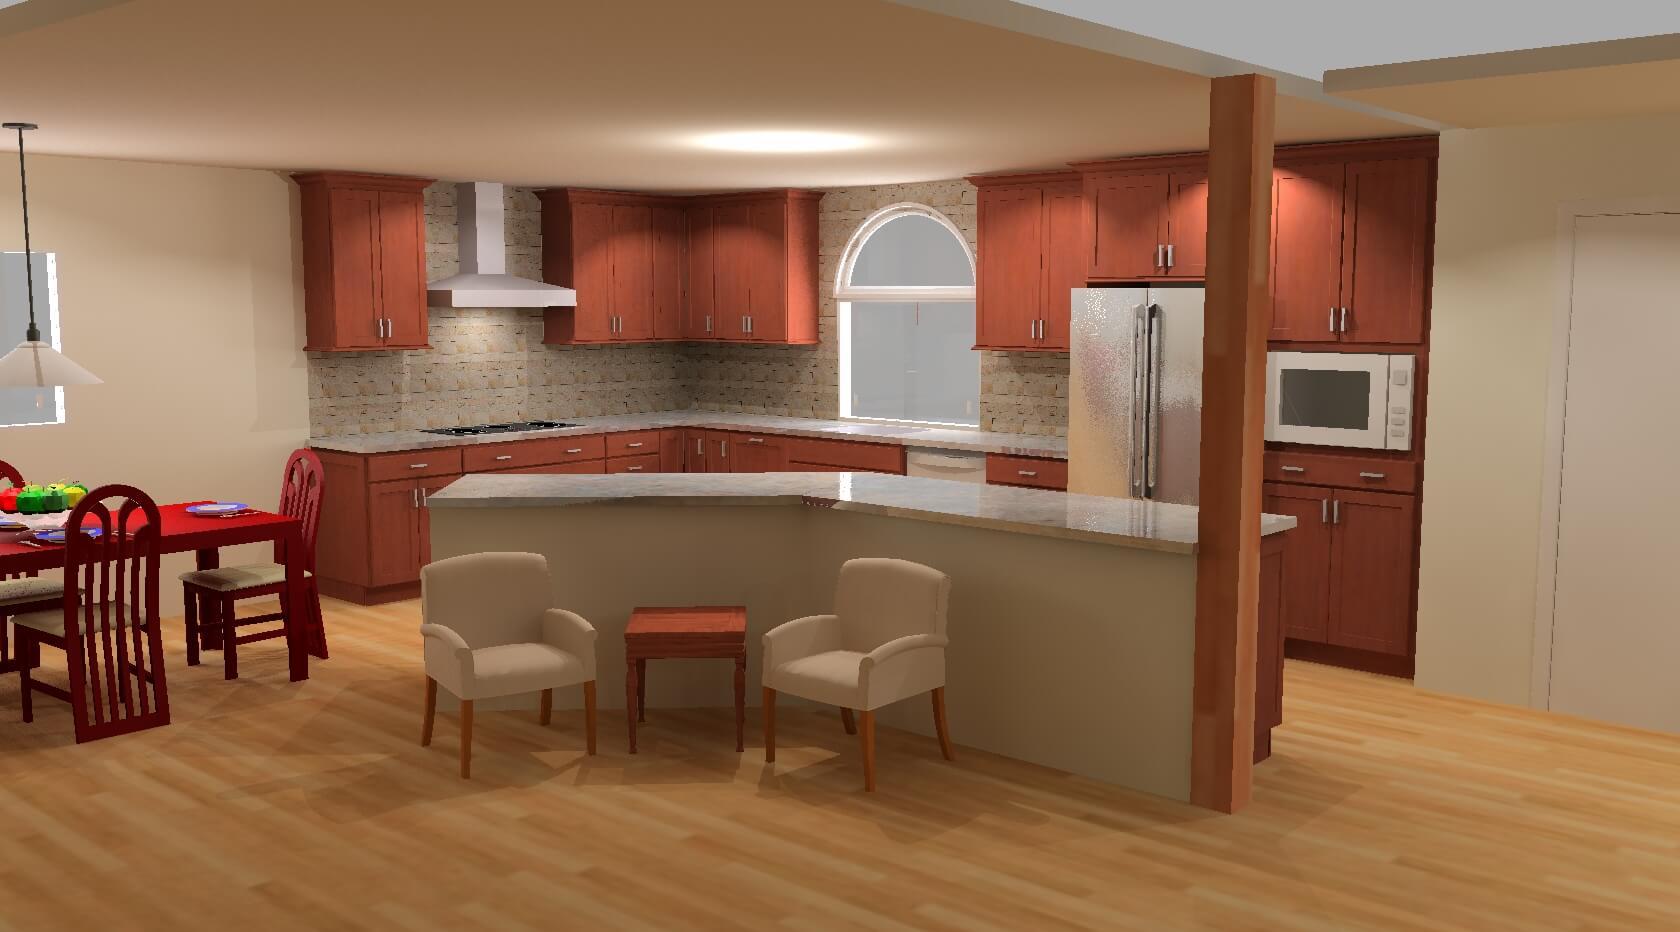 3d model of a warm open concept kitchen